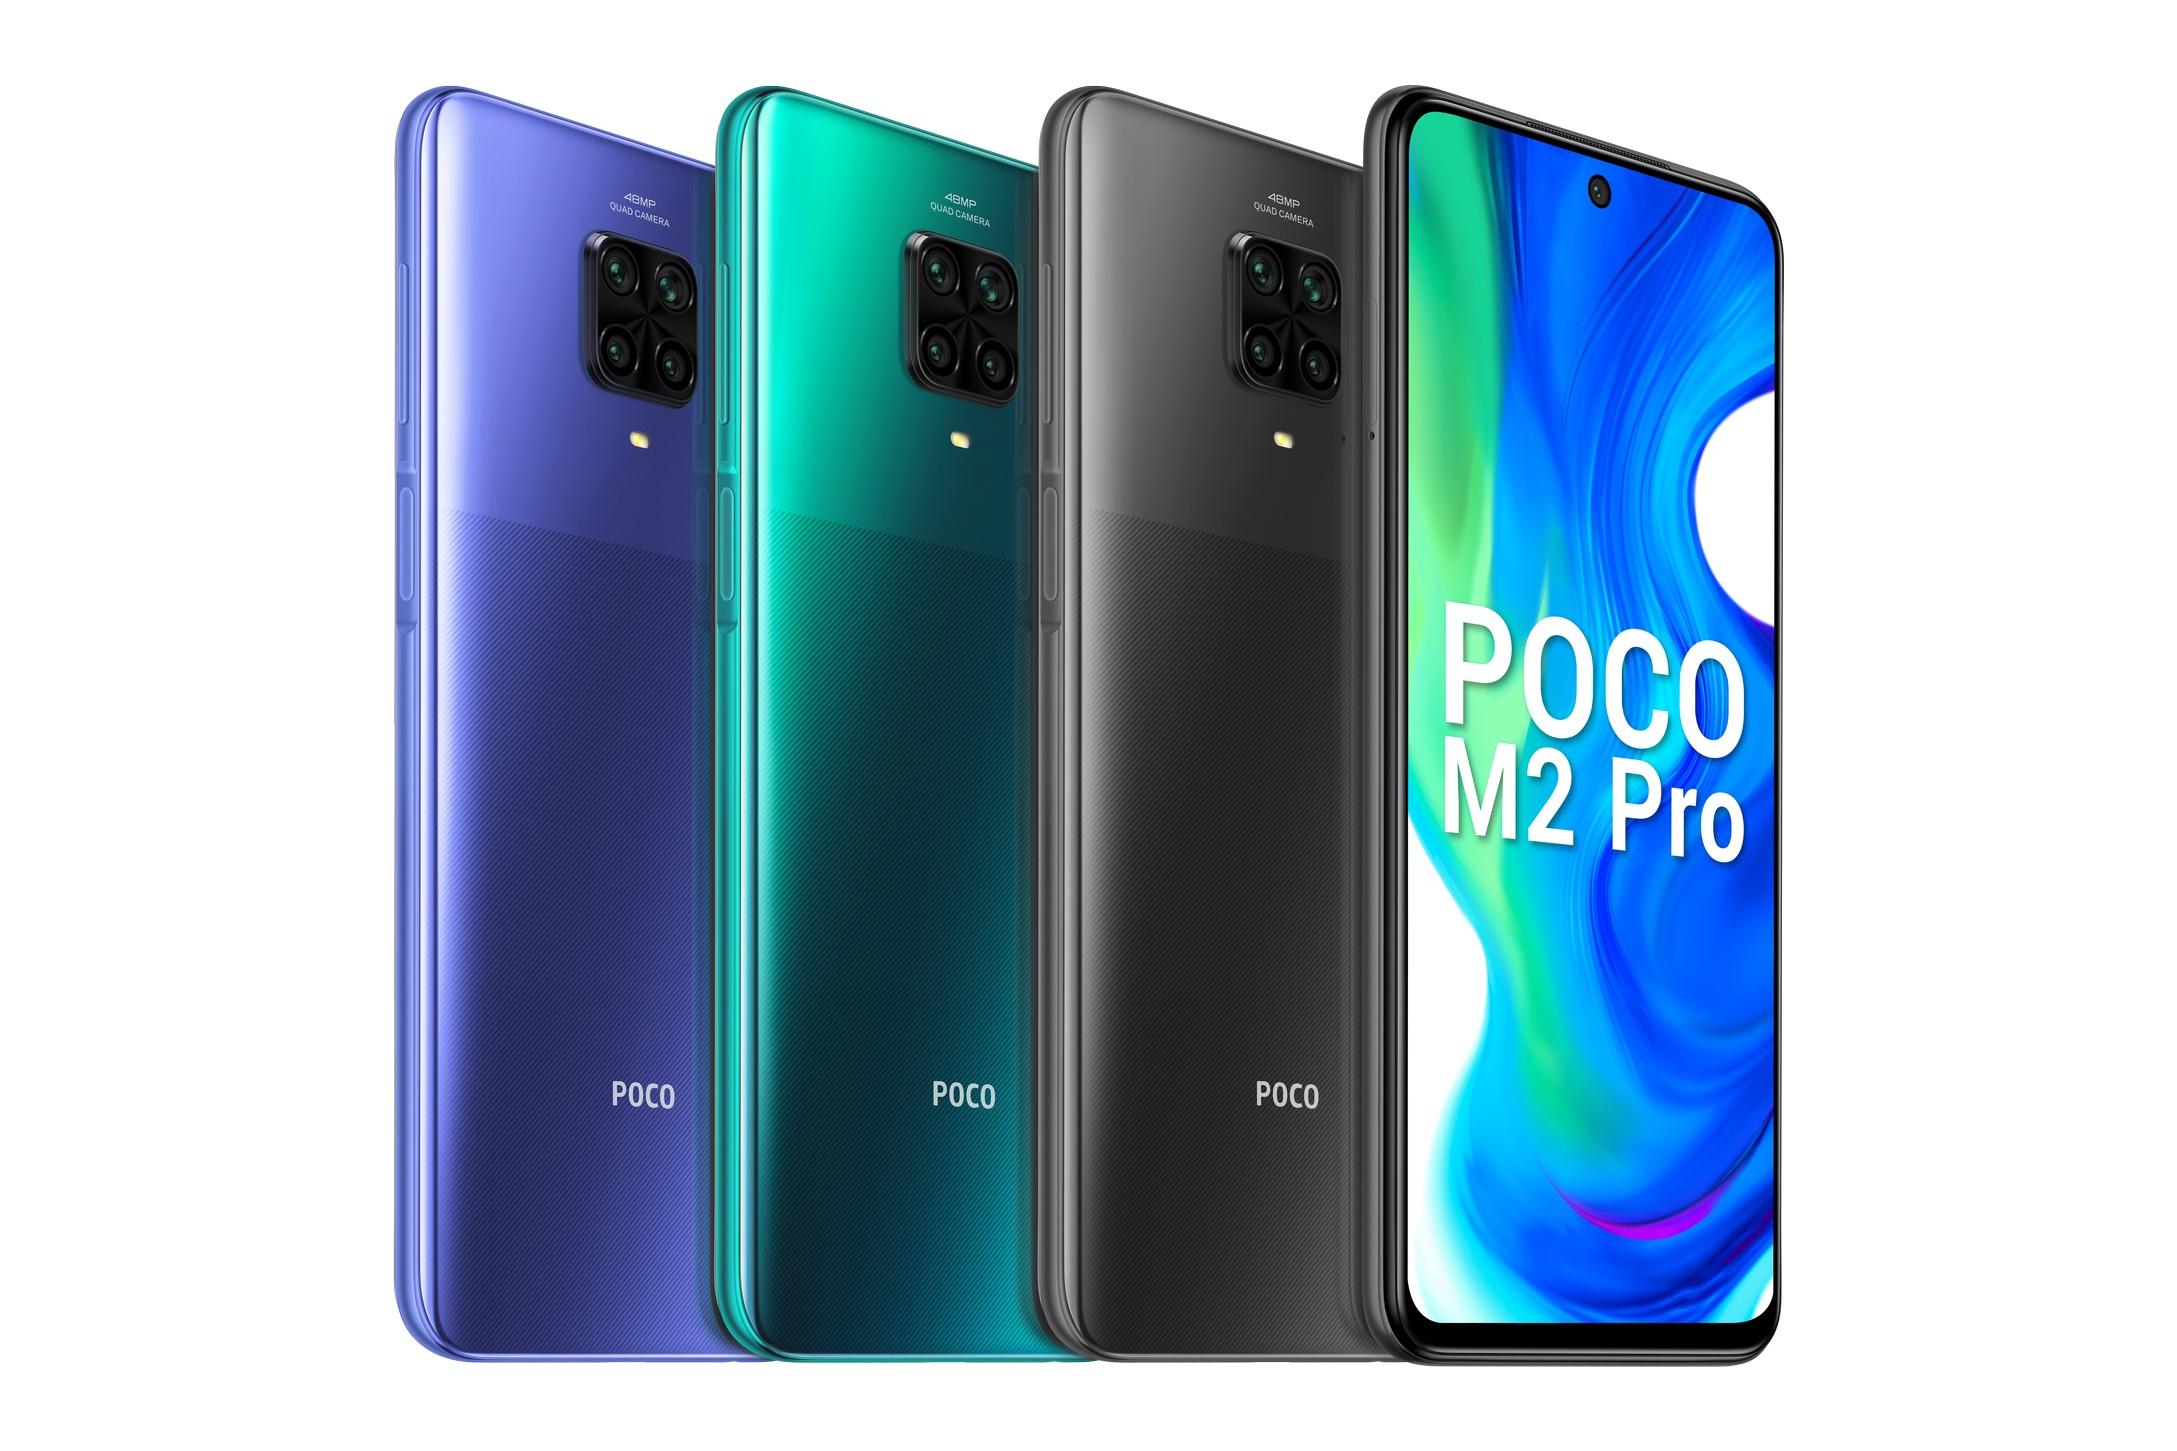 Новый бюджетник Poco M2 Pro — SoC Snapdragon 720G 5000 мА•ч и 33-ваттная зарядка при цене ниже $200